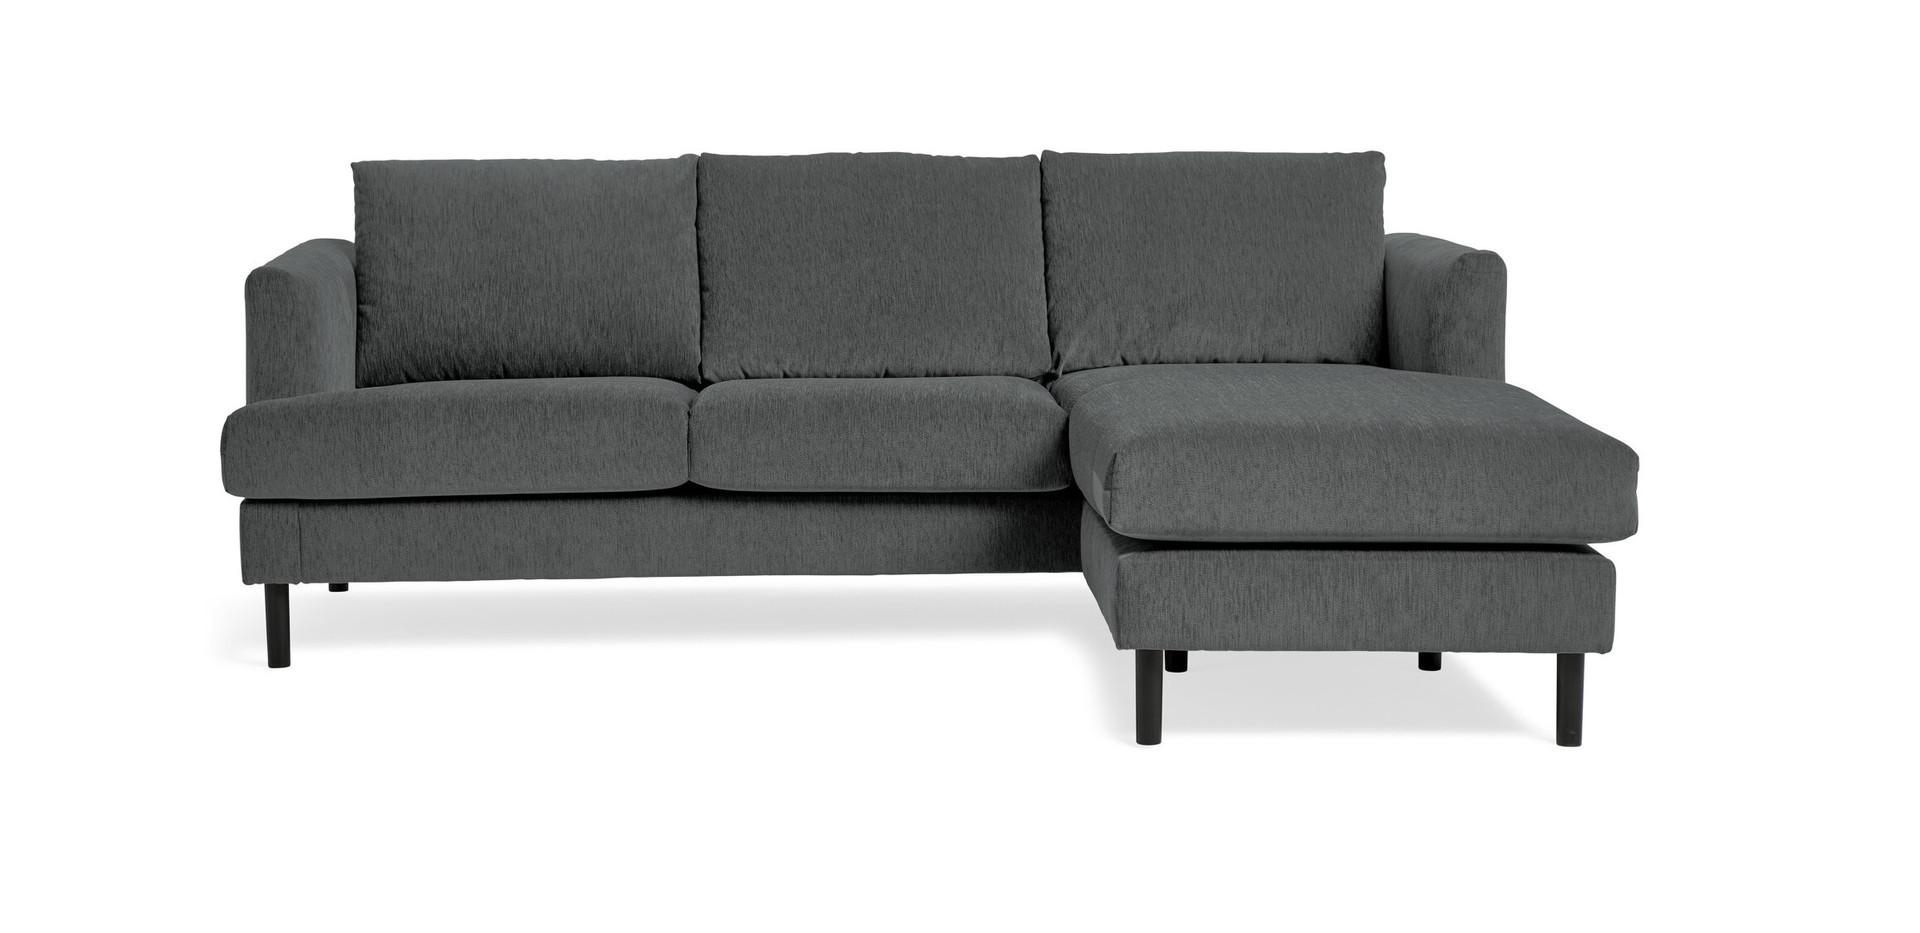 Maison 3SL Palma grey